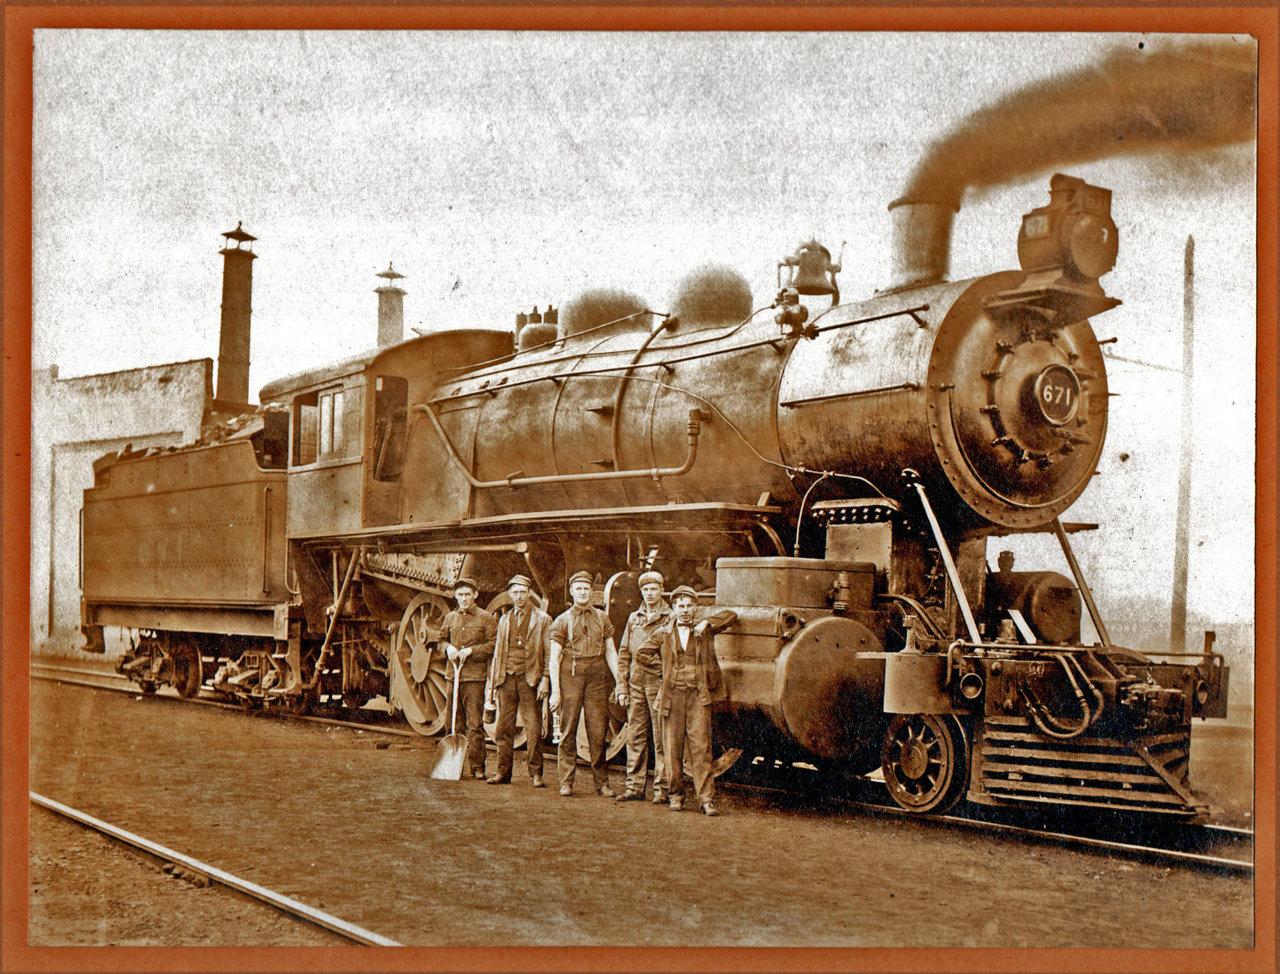 Train engine-Great Grampa Corby, engineer-x.jpg